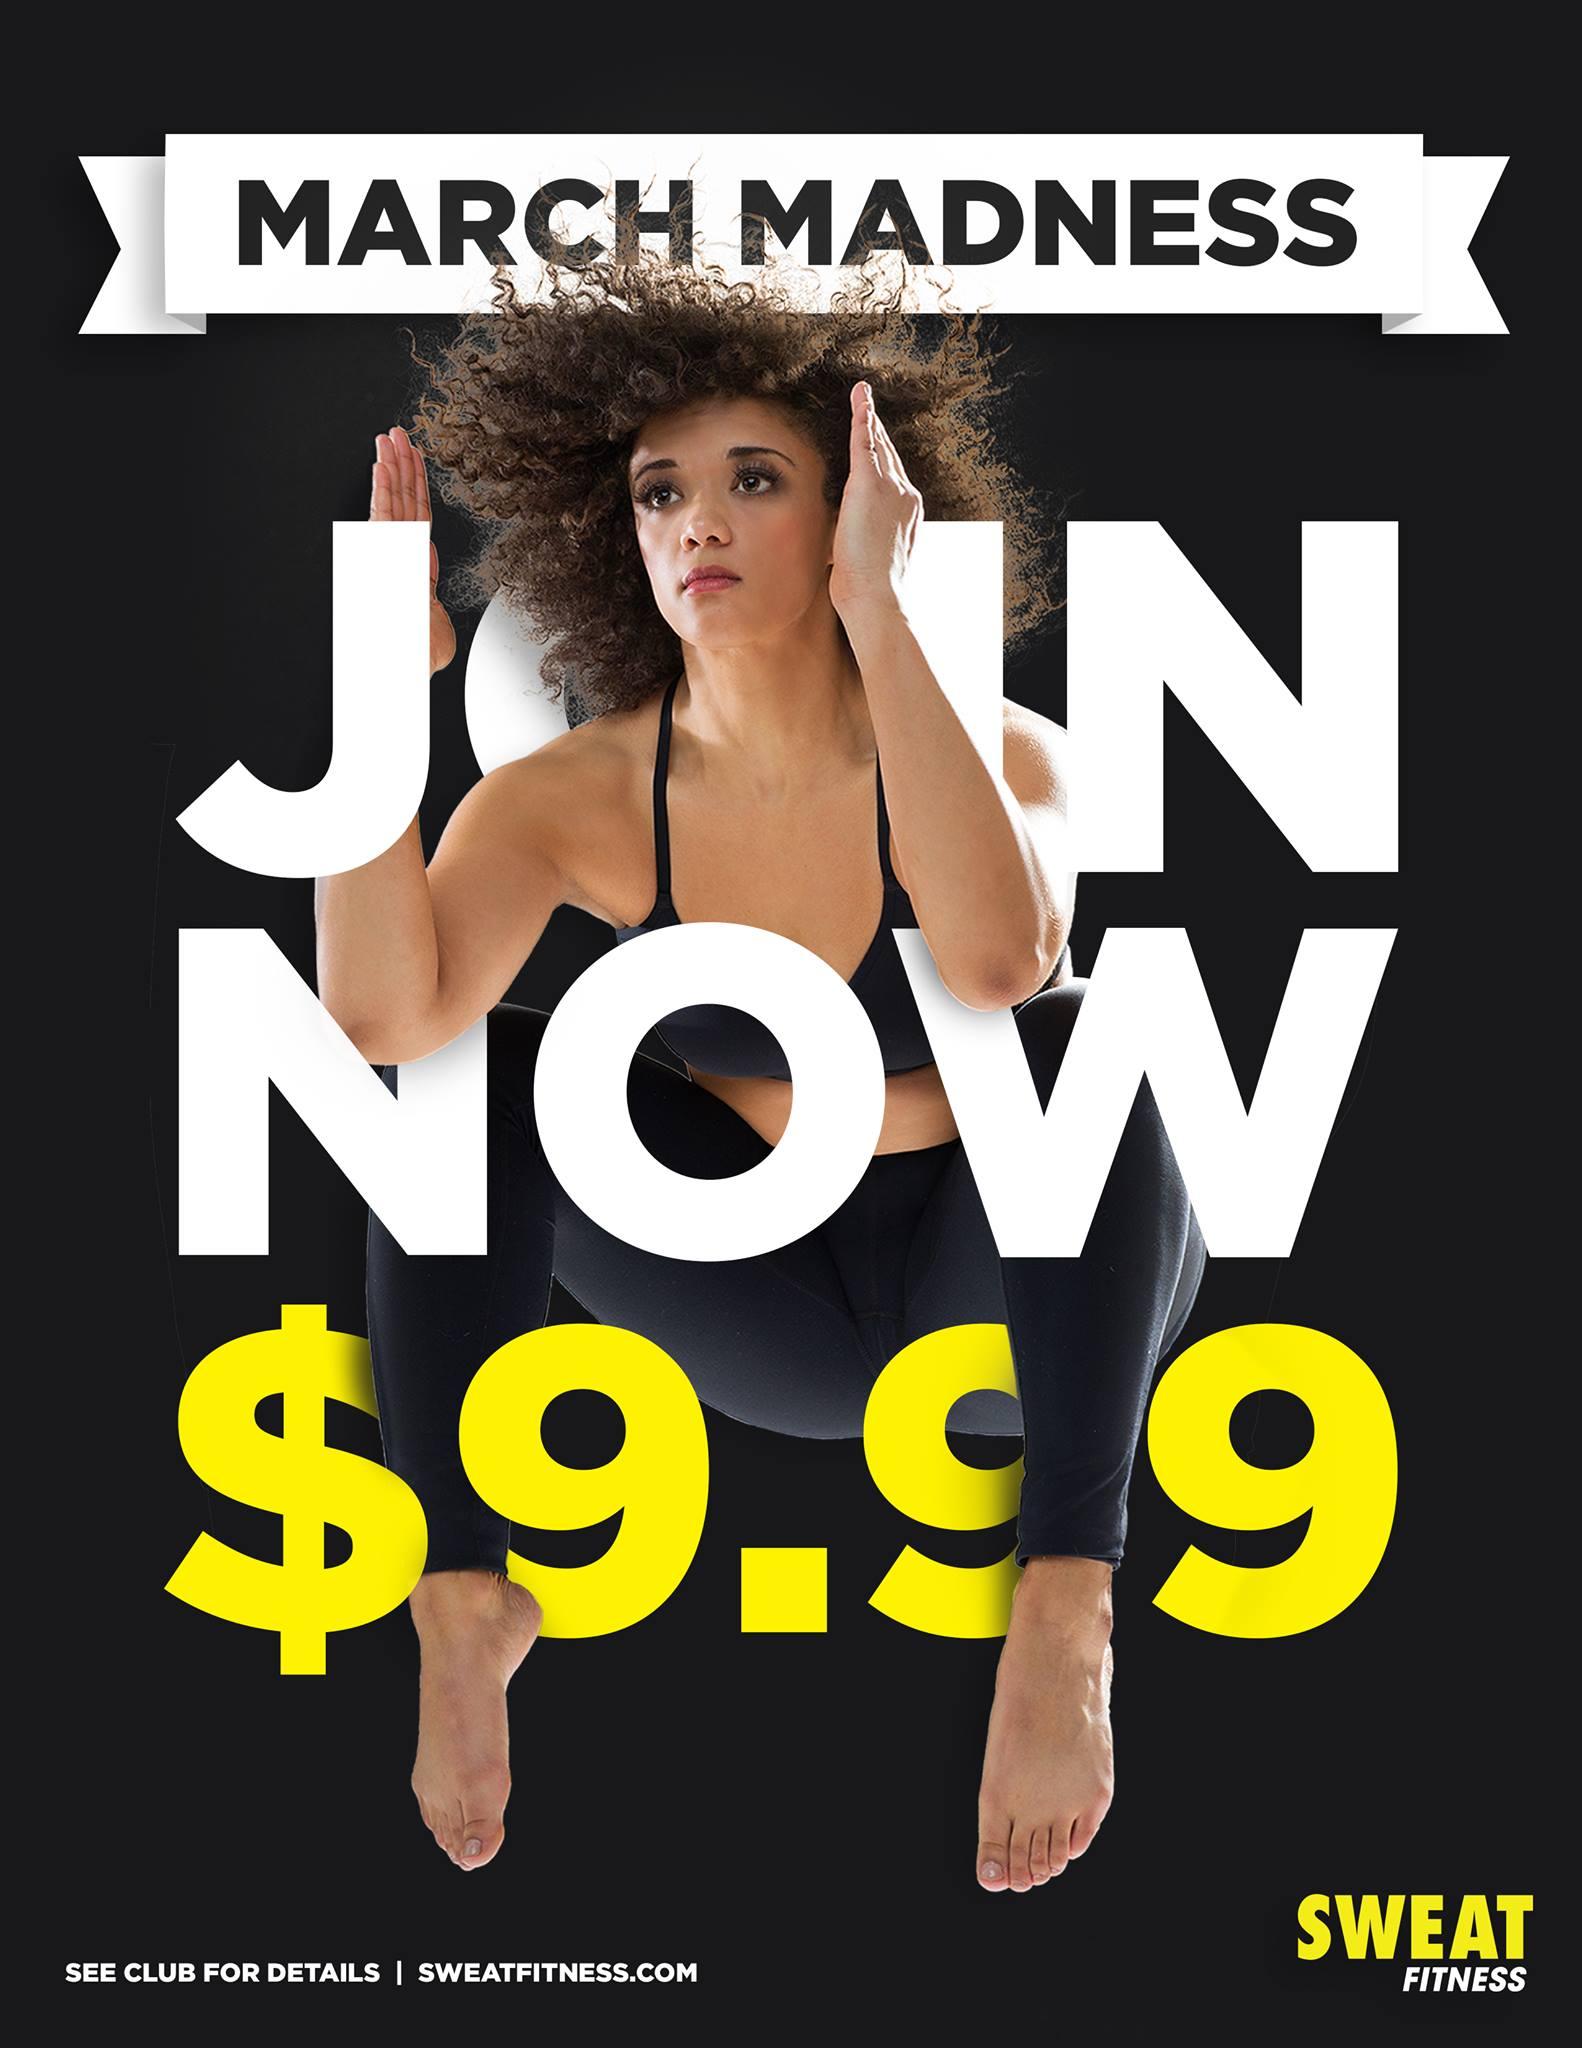 $9.99 Promotion Image